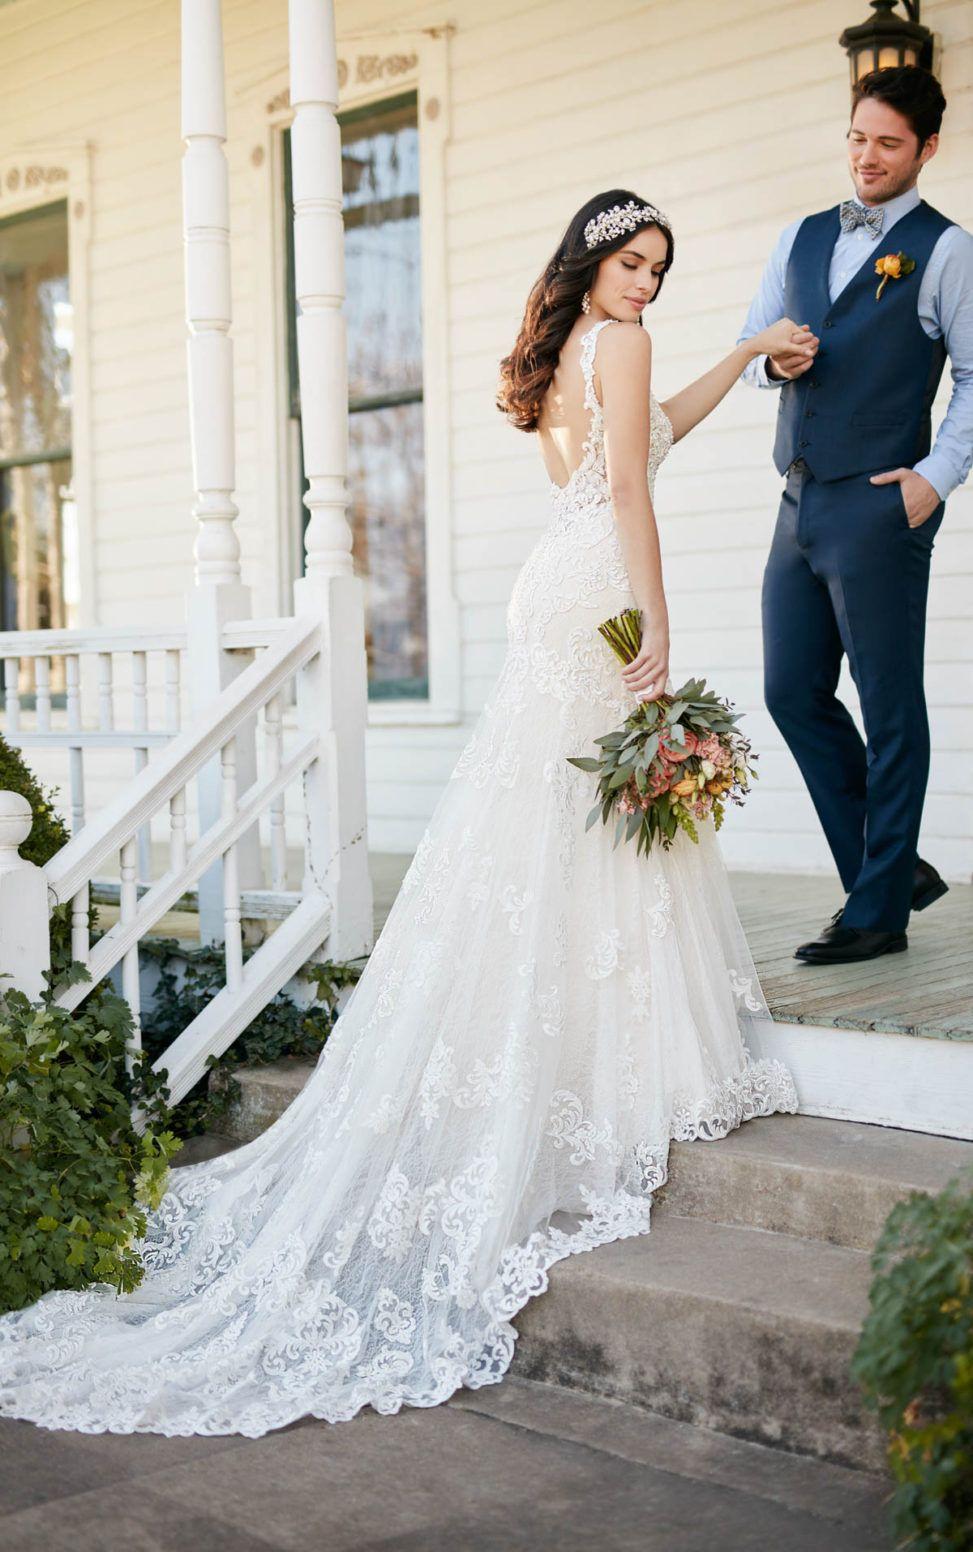 Traditional tunisian wedding dress  Beautiful lace wedding dresses ideas   GirlYard  Fairys